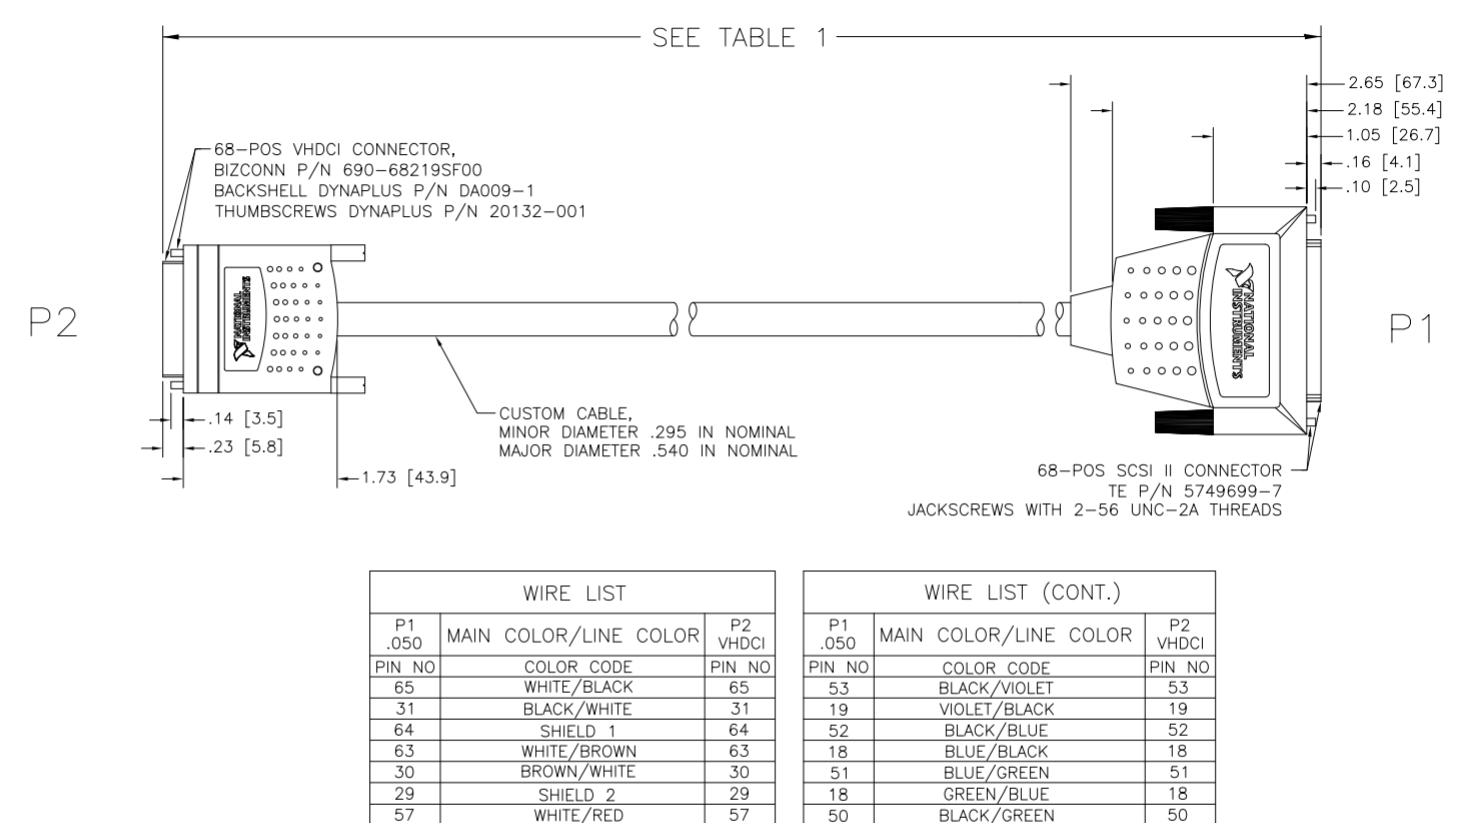 scsi connector wiring diagram download wiring diagrams u2022 rh osomeweb com Diagram of a SAS Drive SCSI Connector Types